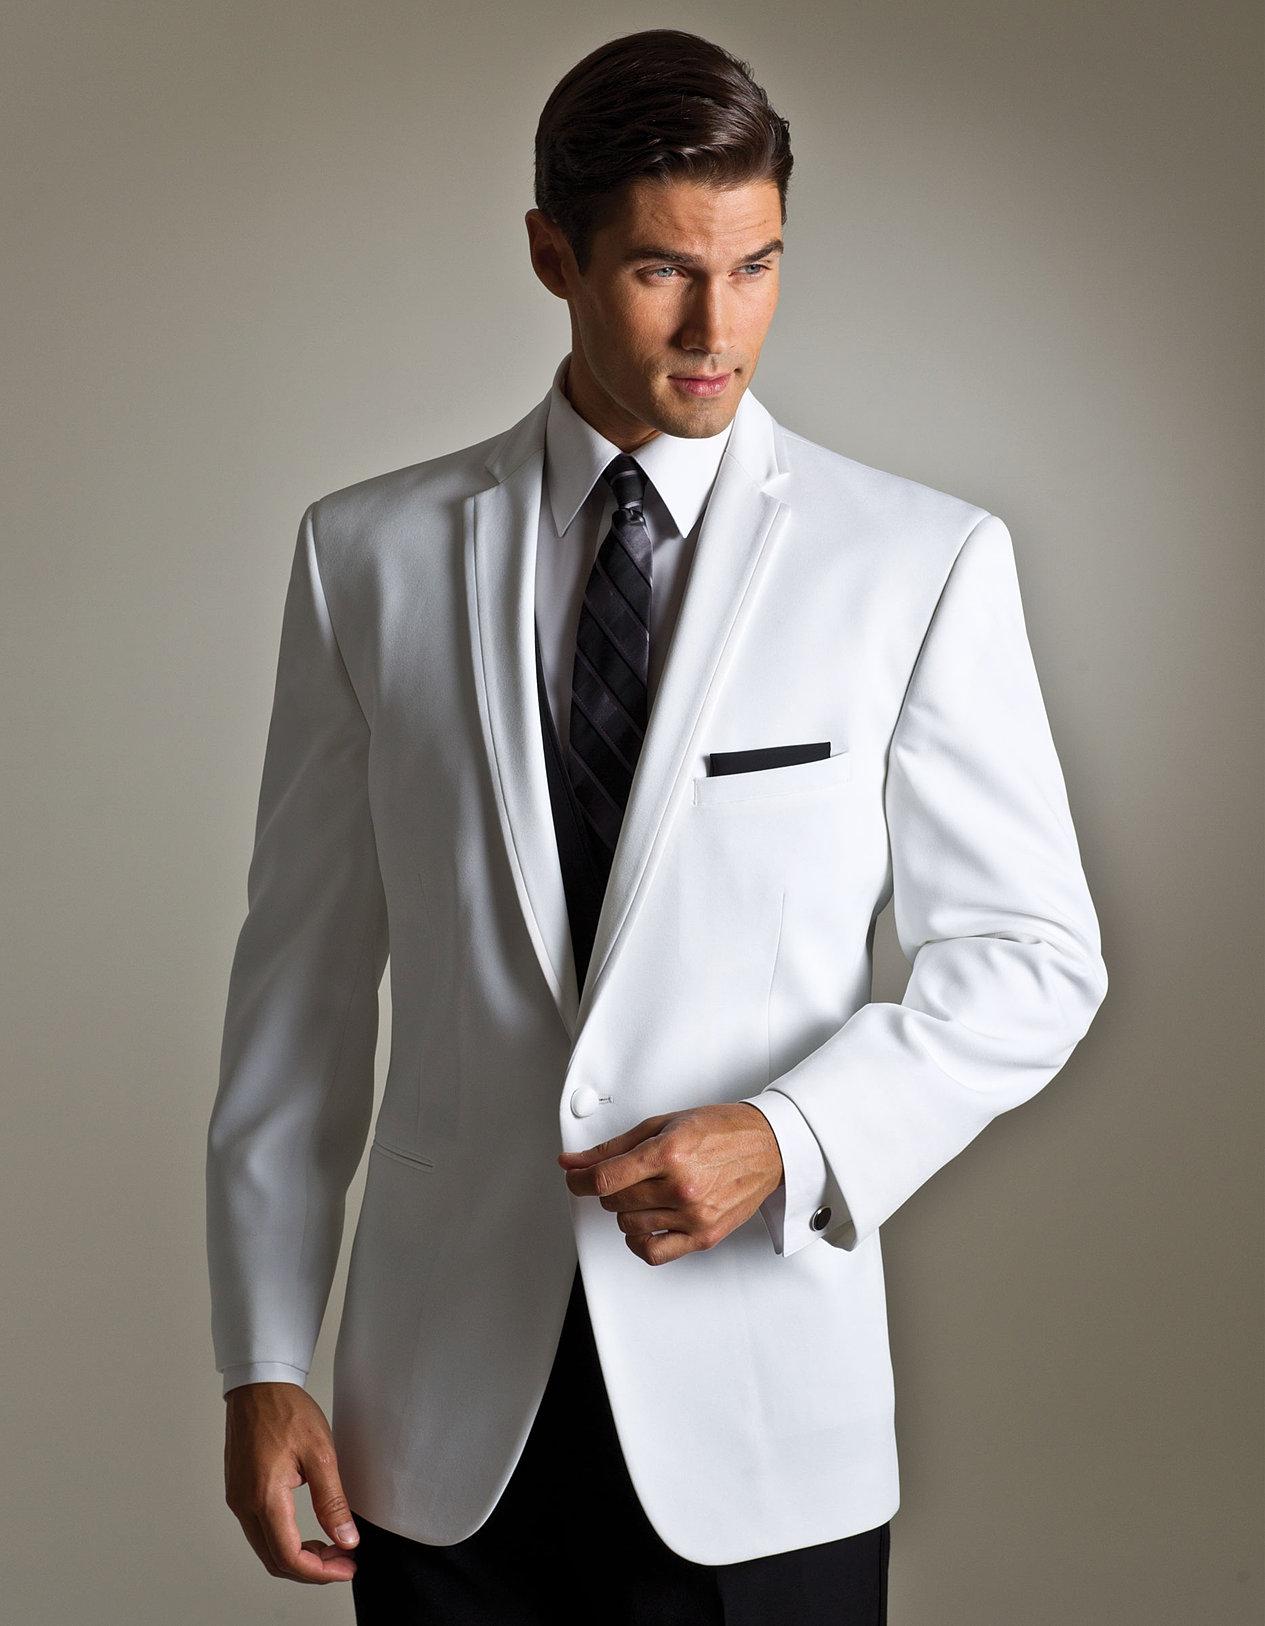 Серый мужской костюм на свадьбу фото